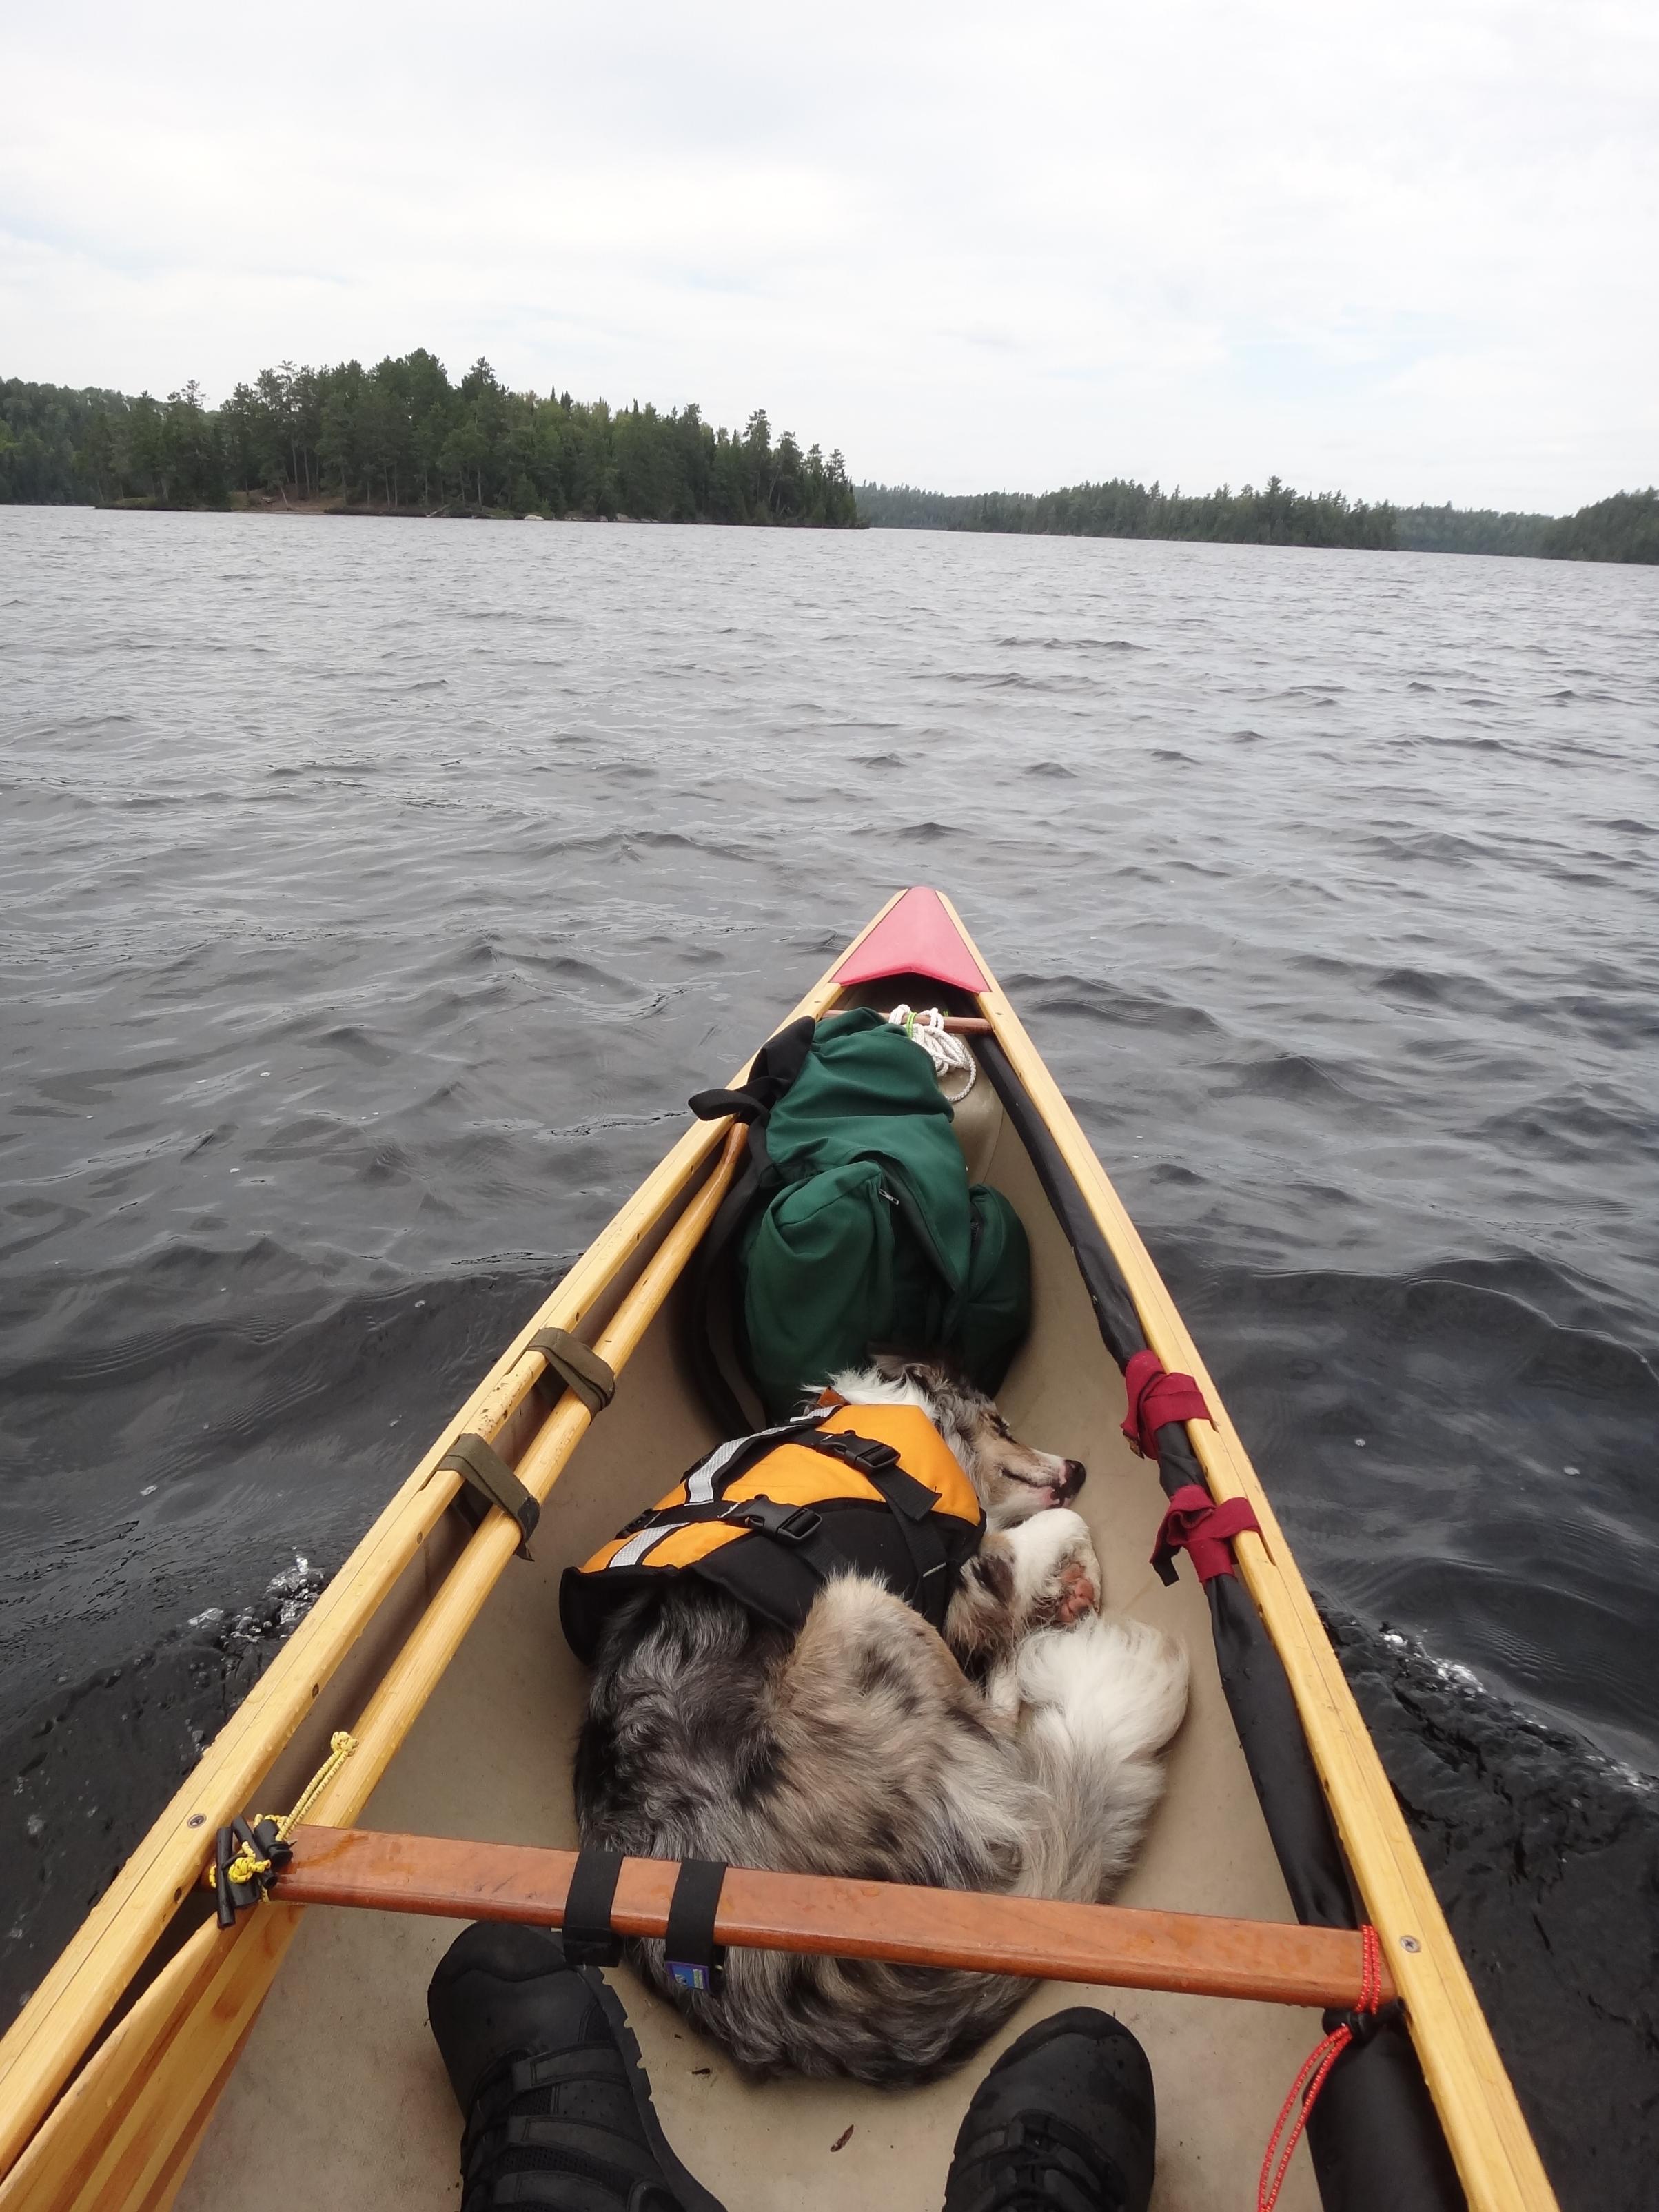 BWCA Solo Canoe w/ Dog Boundary Waters Group Forum: Doggie